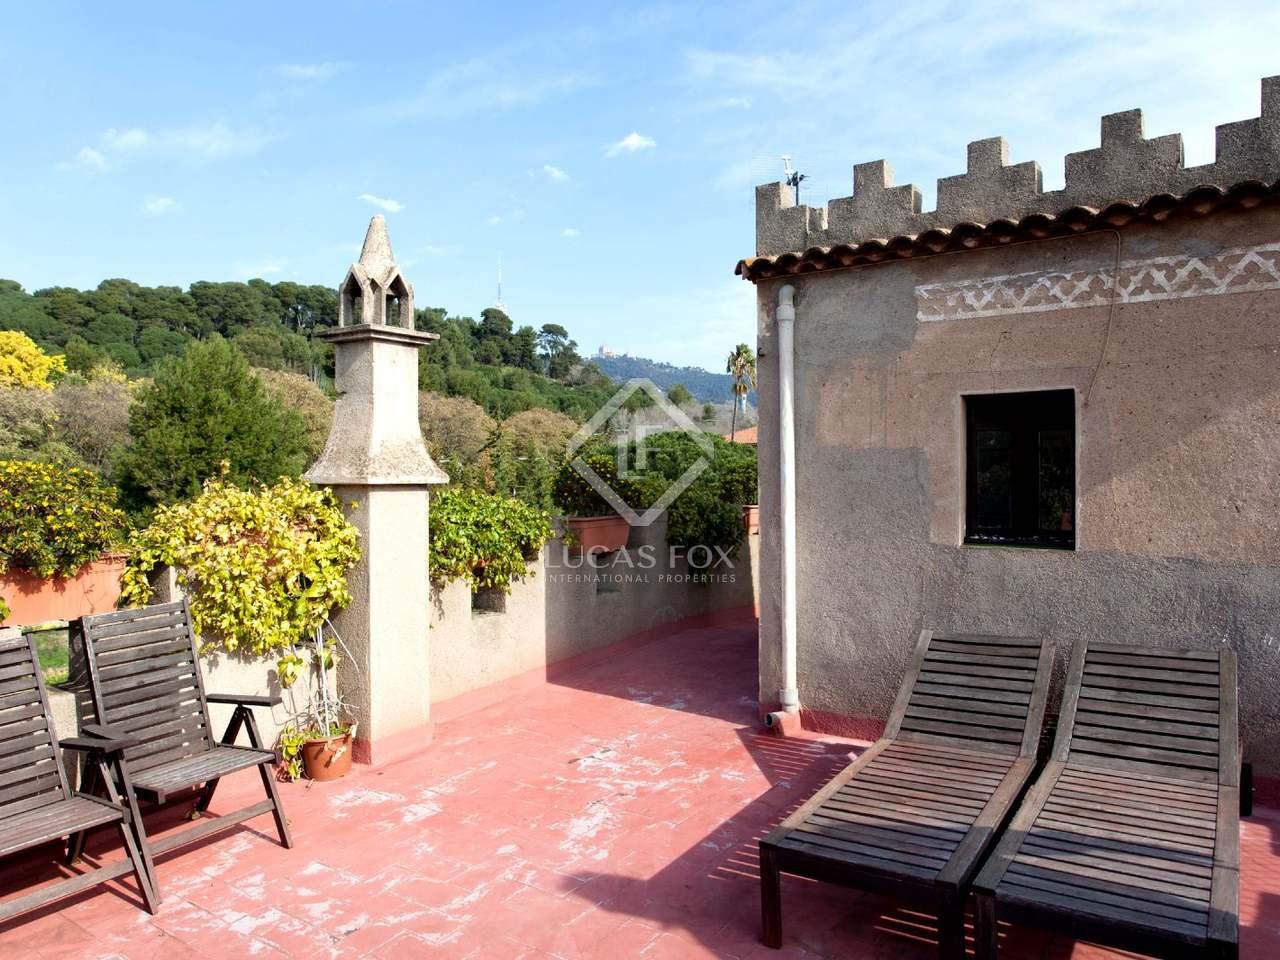 Luxury property for sale in pedralbes barcelona zona alta - Zona alta barcelona ...